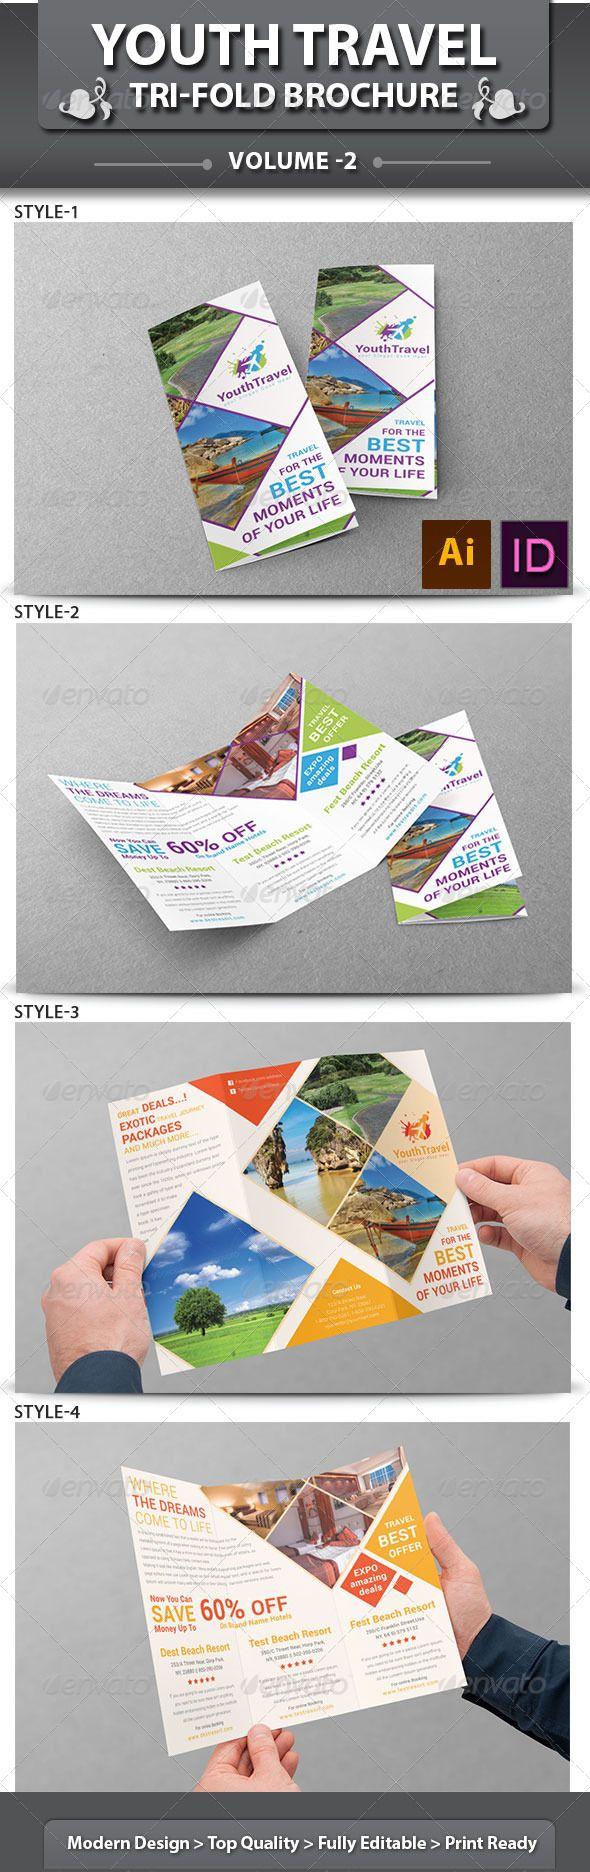 Travel Business Tri-fold Brochure | Volume 3  #GraphicRiver I love the diamond concept!